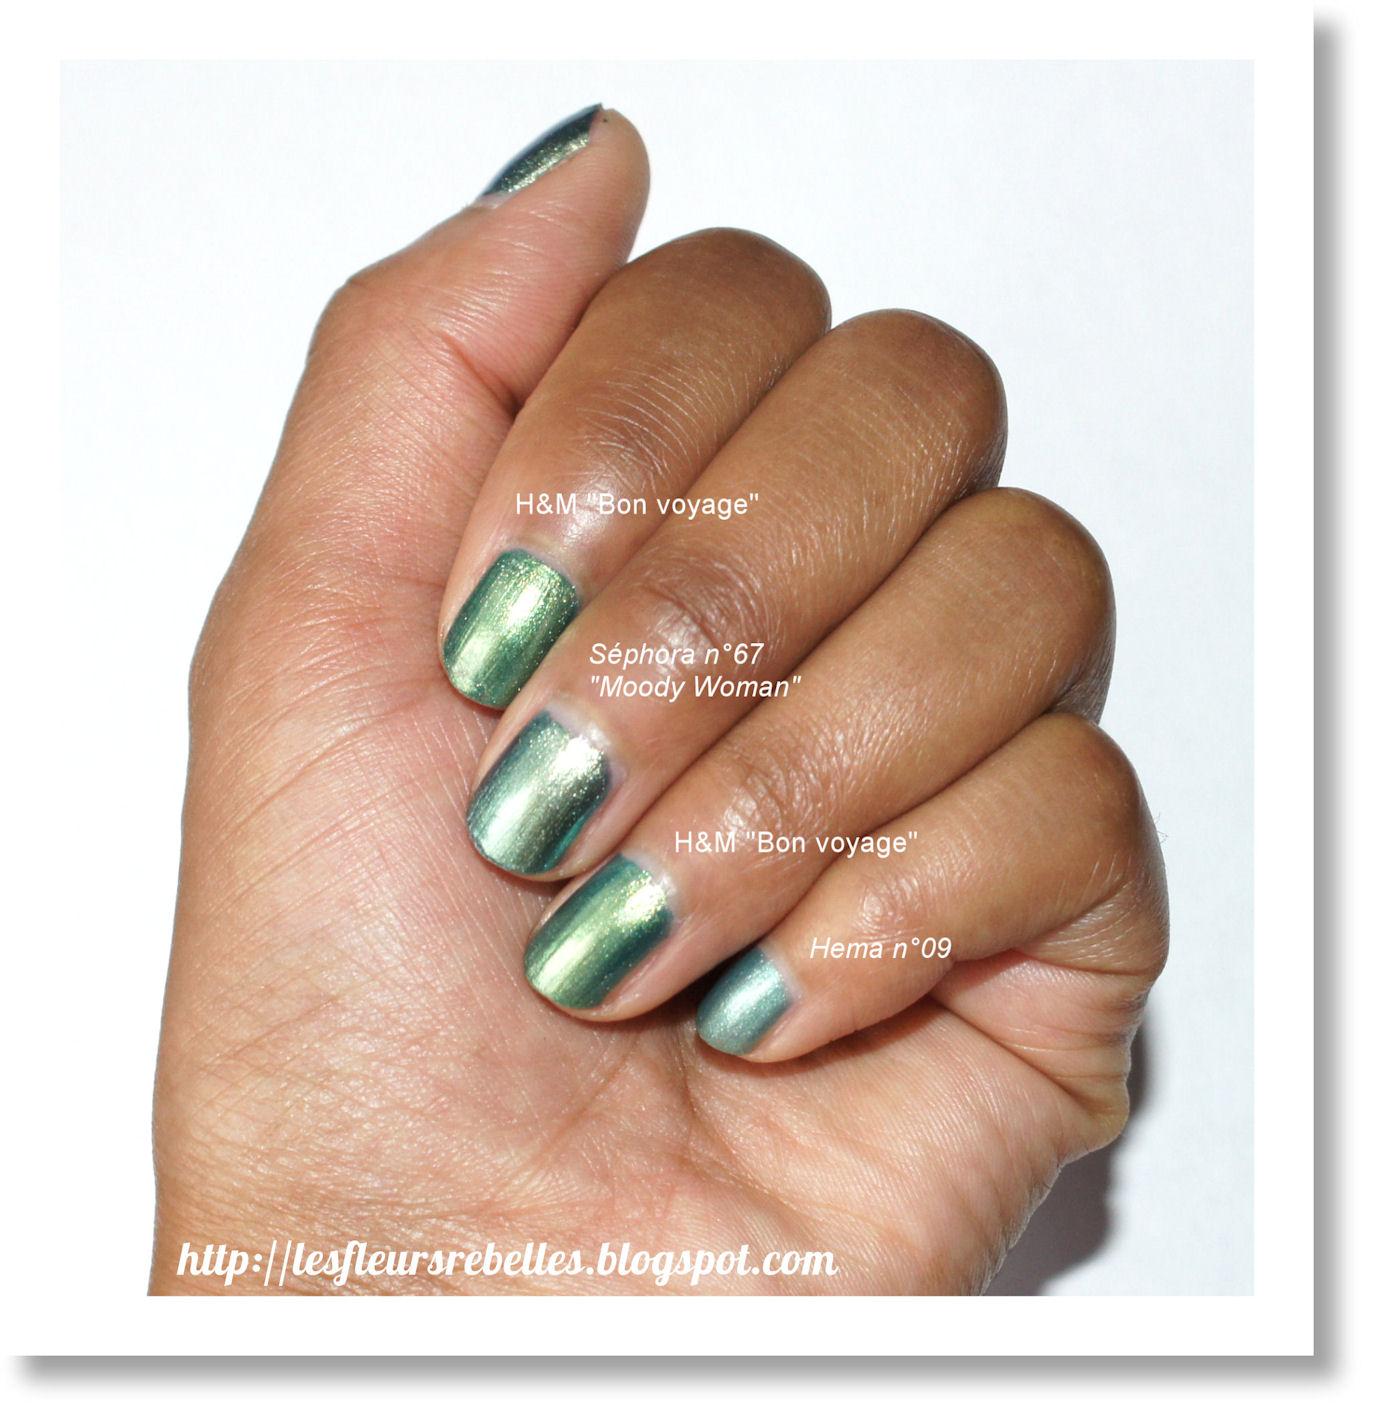 033d1cede7 De jolis vernis verts [Sephora, H&M et Hema]